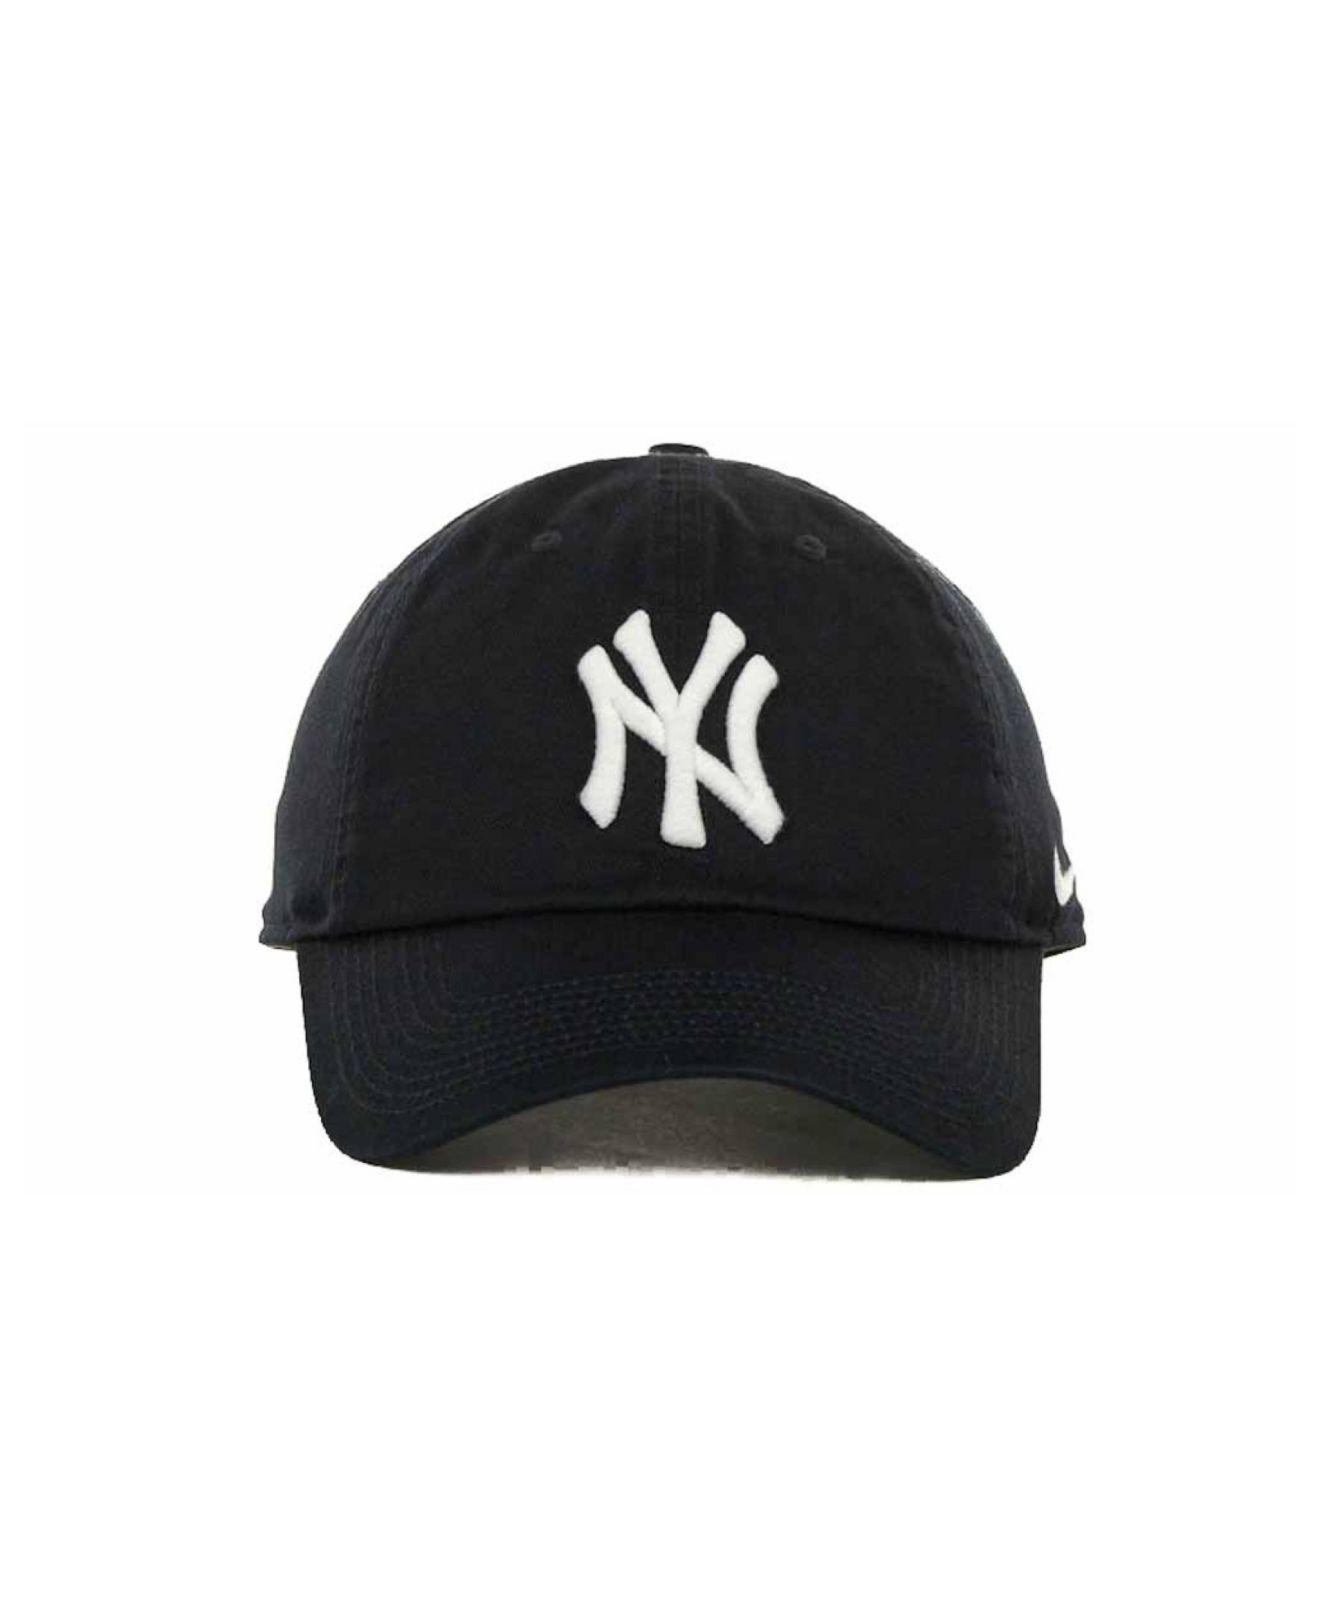 Lyst - Nike New York Yankees Stadium Cap in Blue for Men c40347c6f1e